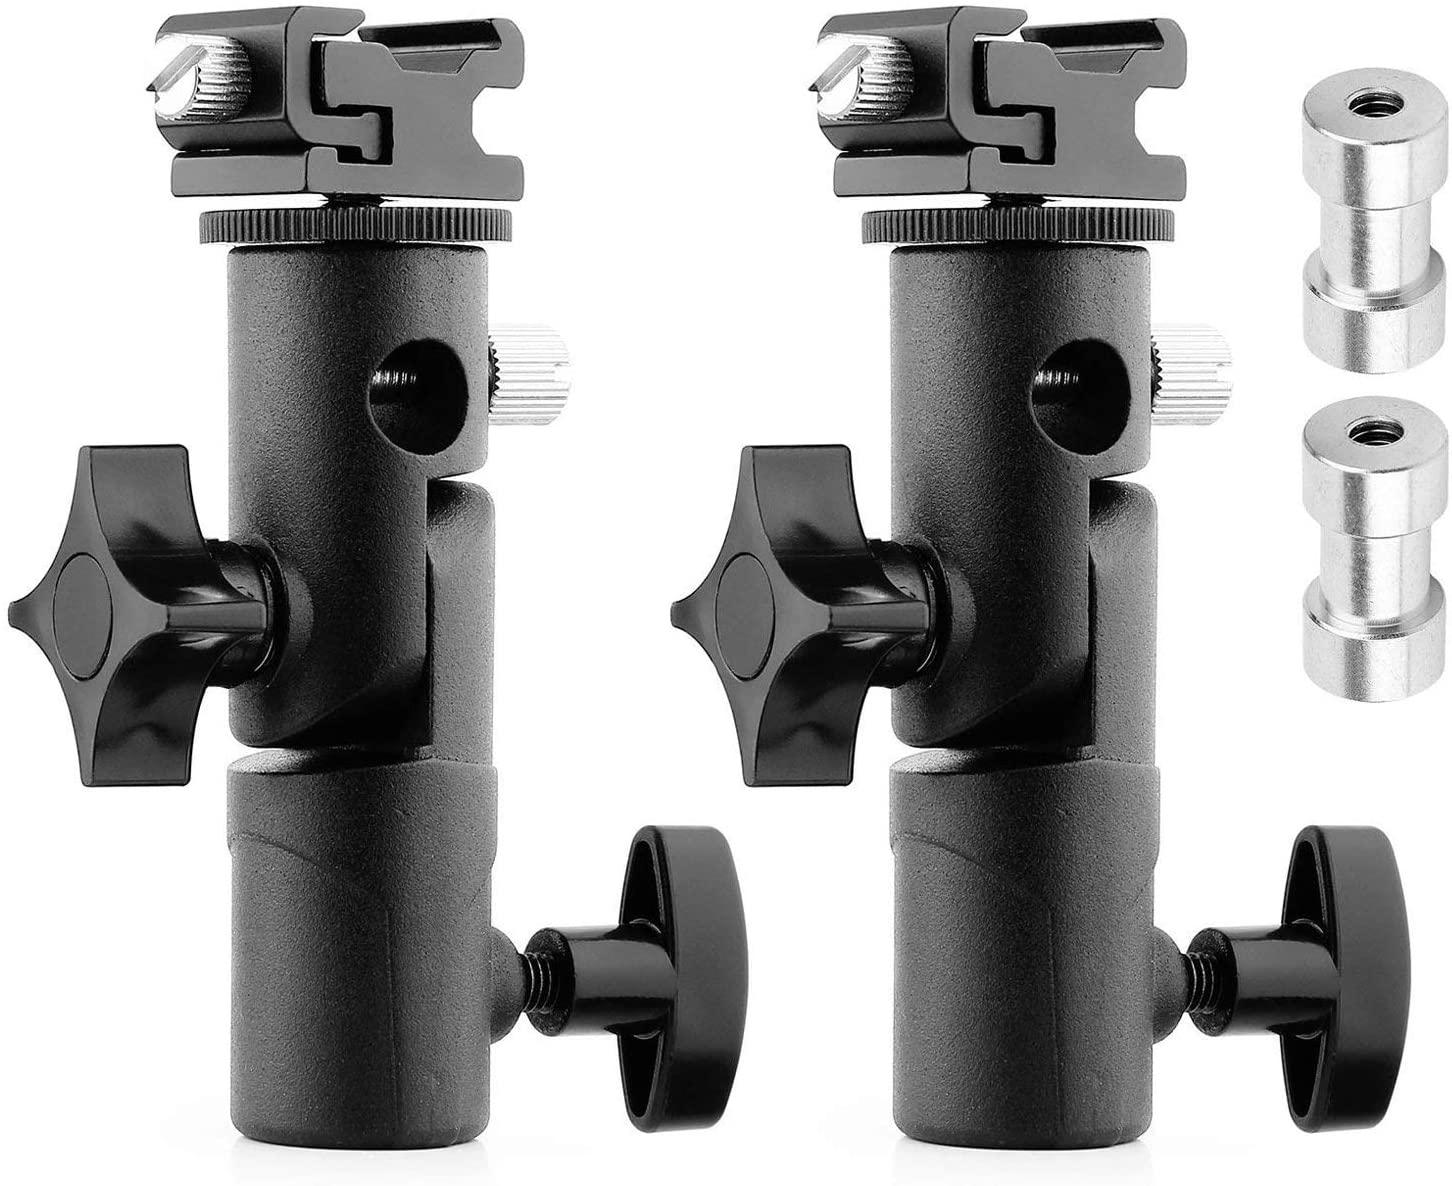 CHUN-Accessory - Top Deals 2Pack Camera Flash Speedlite Mount Swivel Light Stand Bracket with Umbrella Reflector Holder for Camera DSLR N-ikon